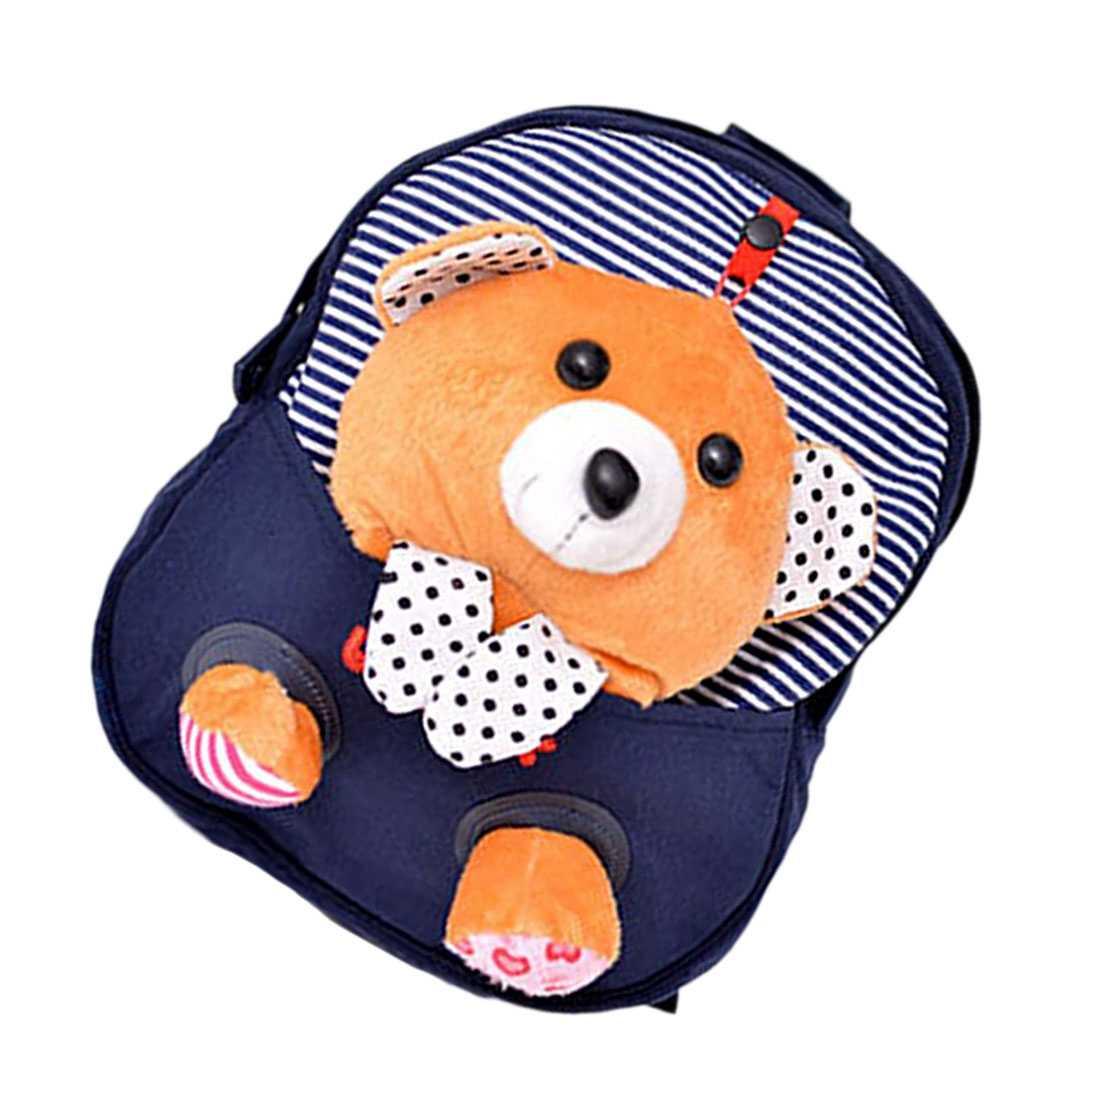 4eb8db204d37 FGGS Hot Mini School Bags Backpacks Children Children's backpack Cartoon  Bear Doll Printing Backpack For 2-6 Year Kids Blue